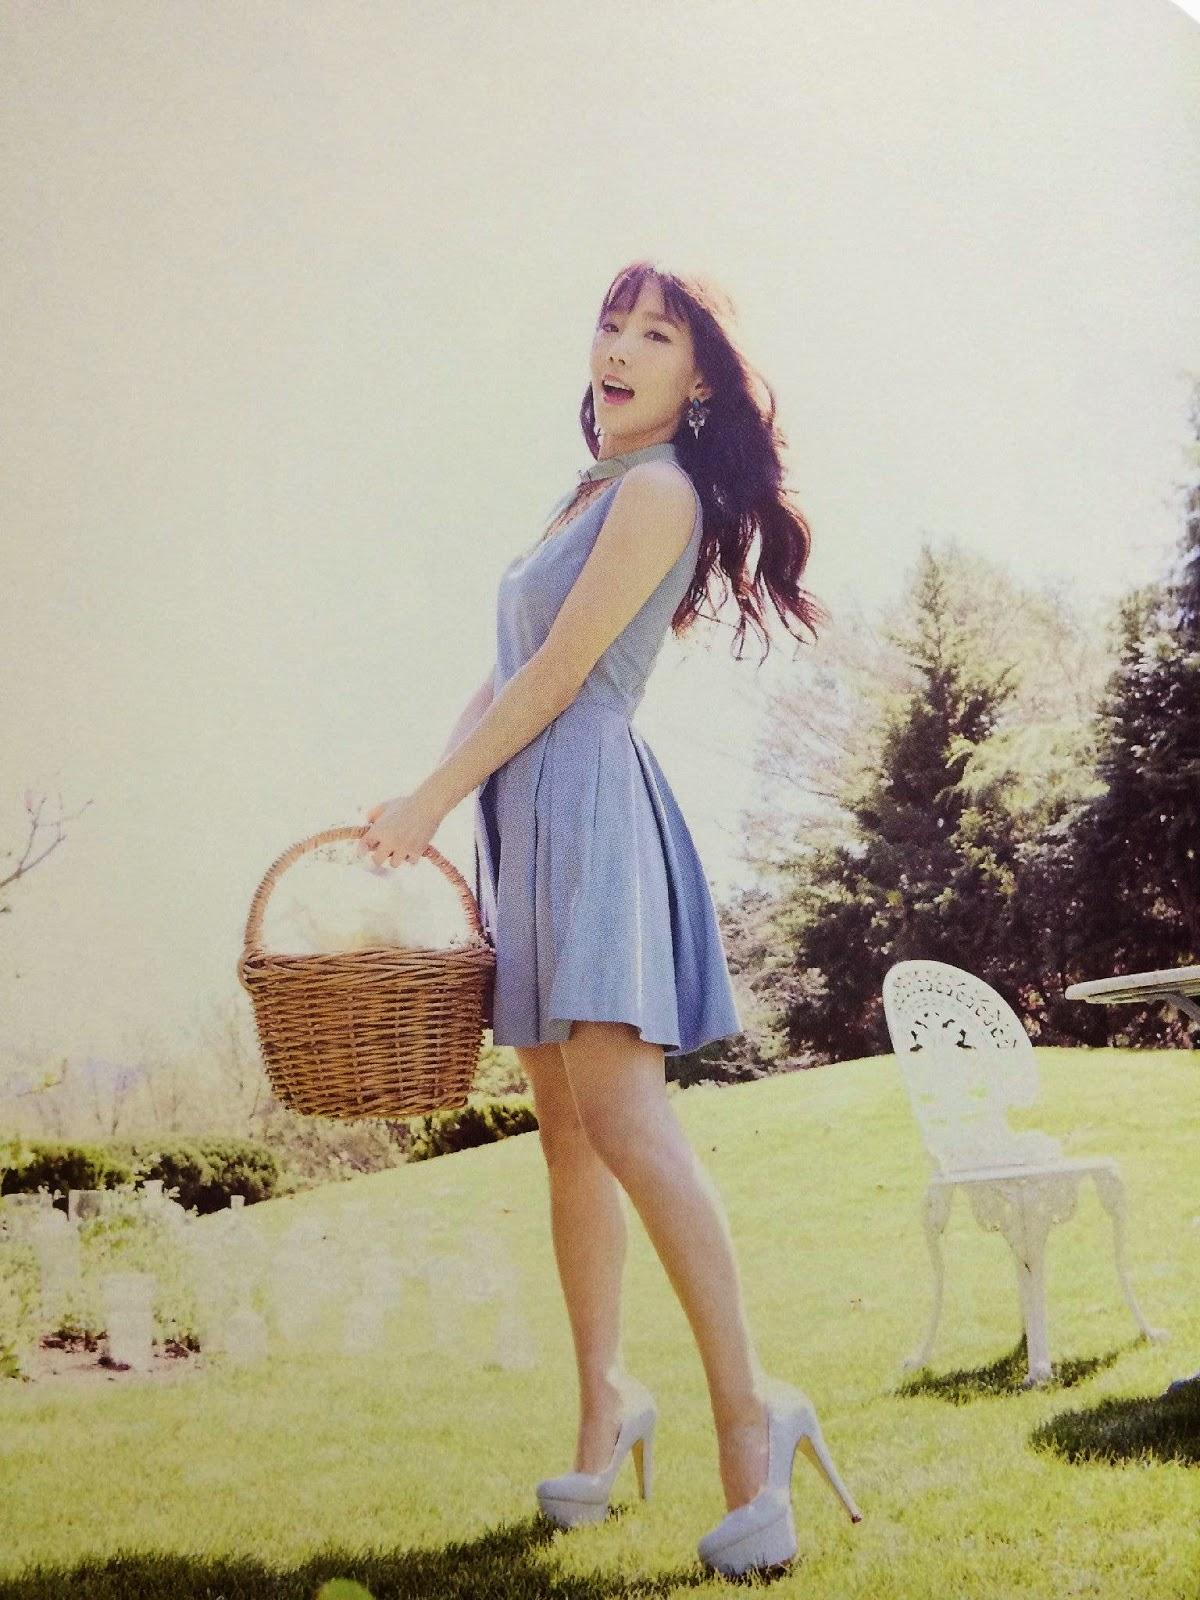 SNSD Taeyeon (태연; テヨン) Girls Generation The Best Scan Photos 4